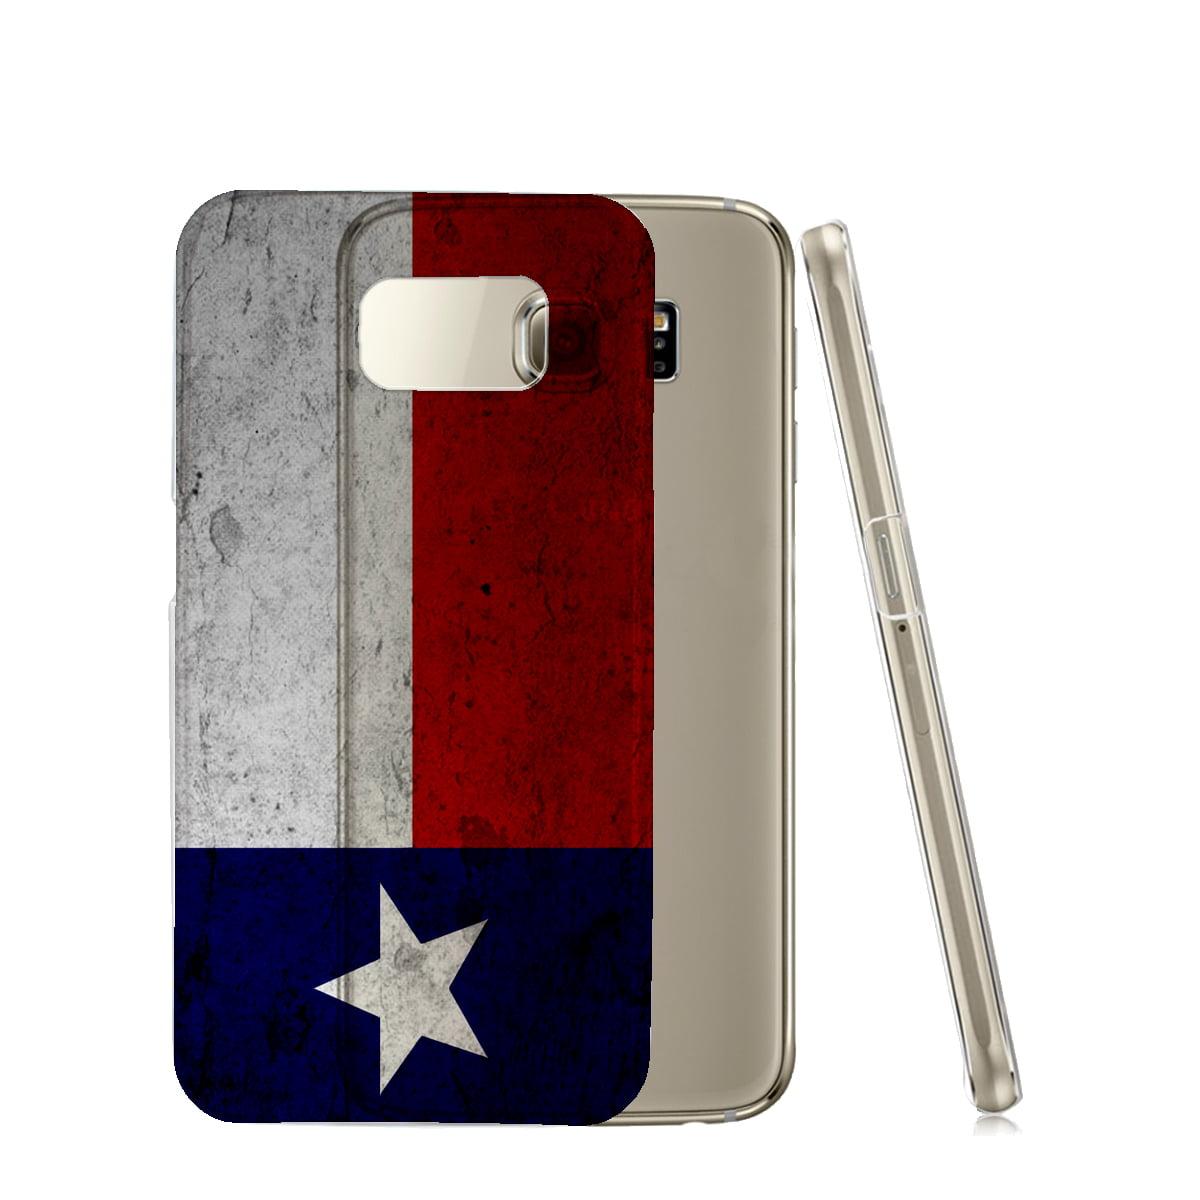 KuzmarK™ Samsung Galaxy S6 Edge Clear Cover Case - Texas Flag Concrete Wall